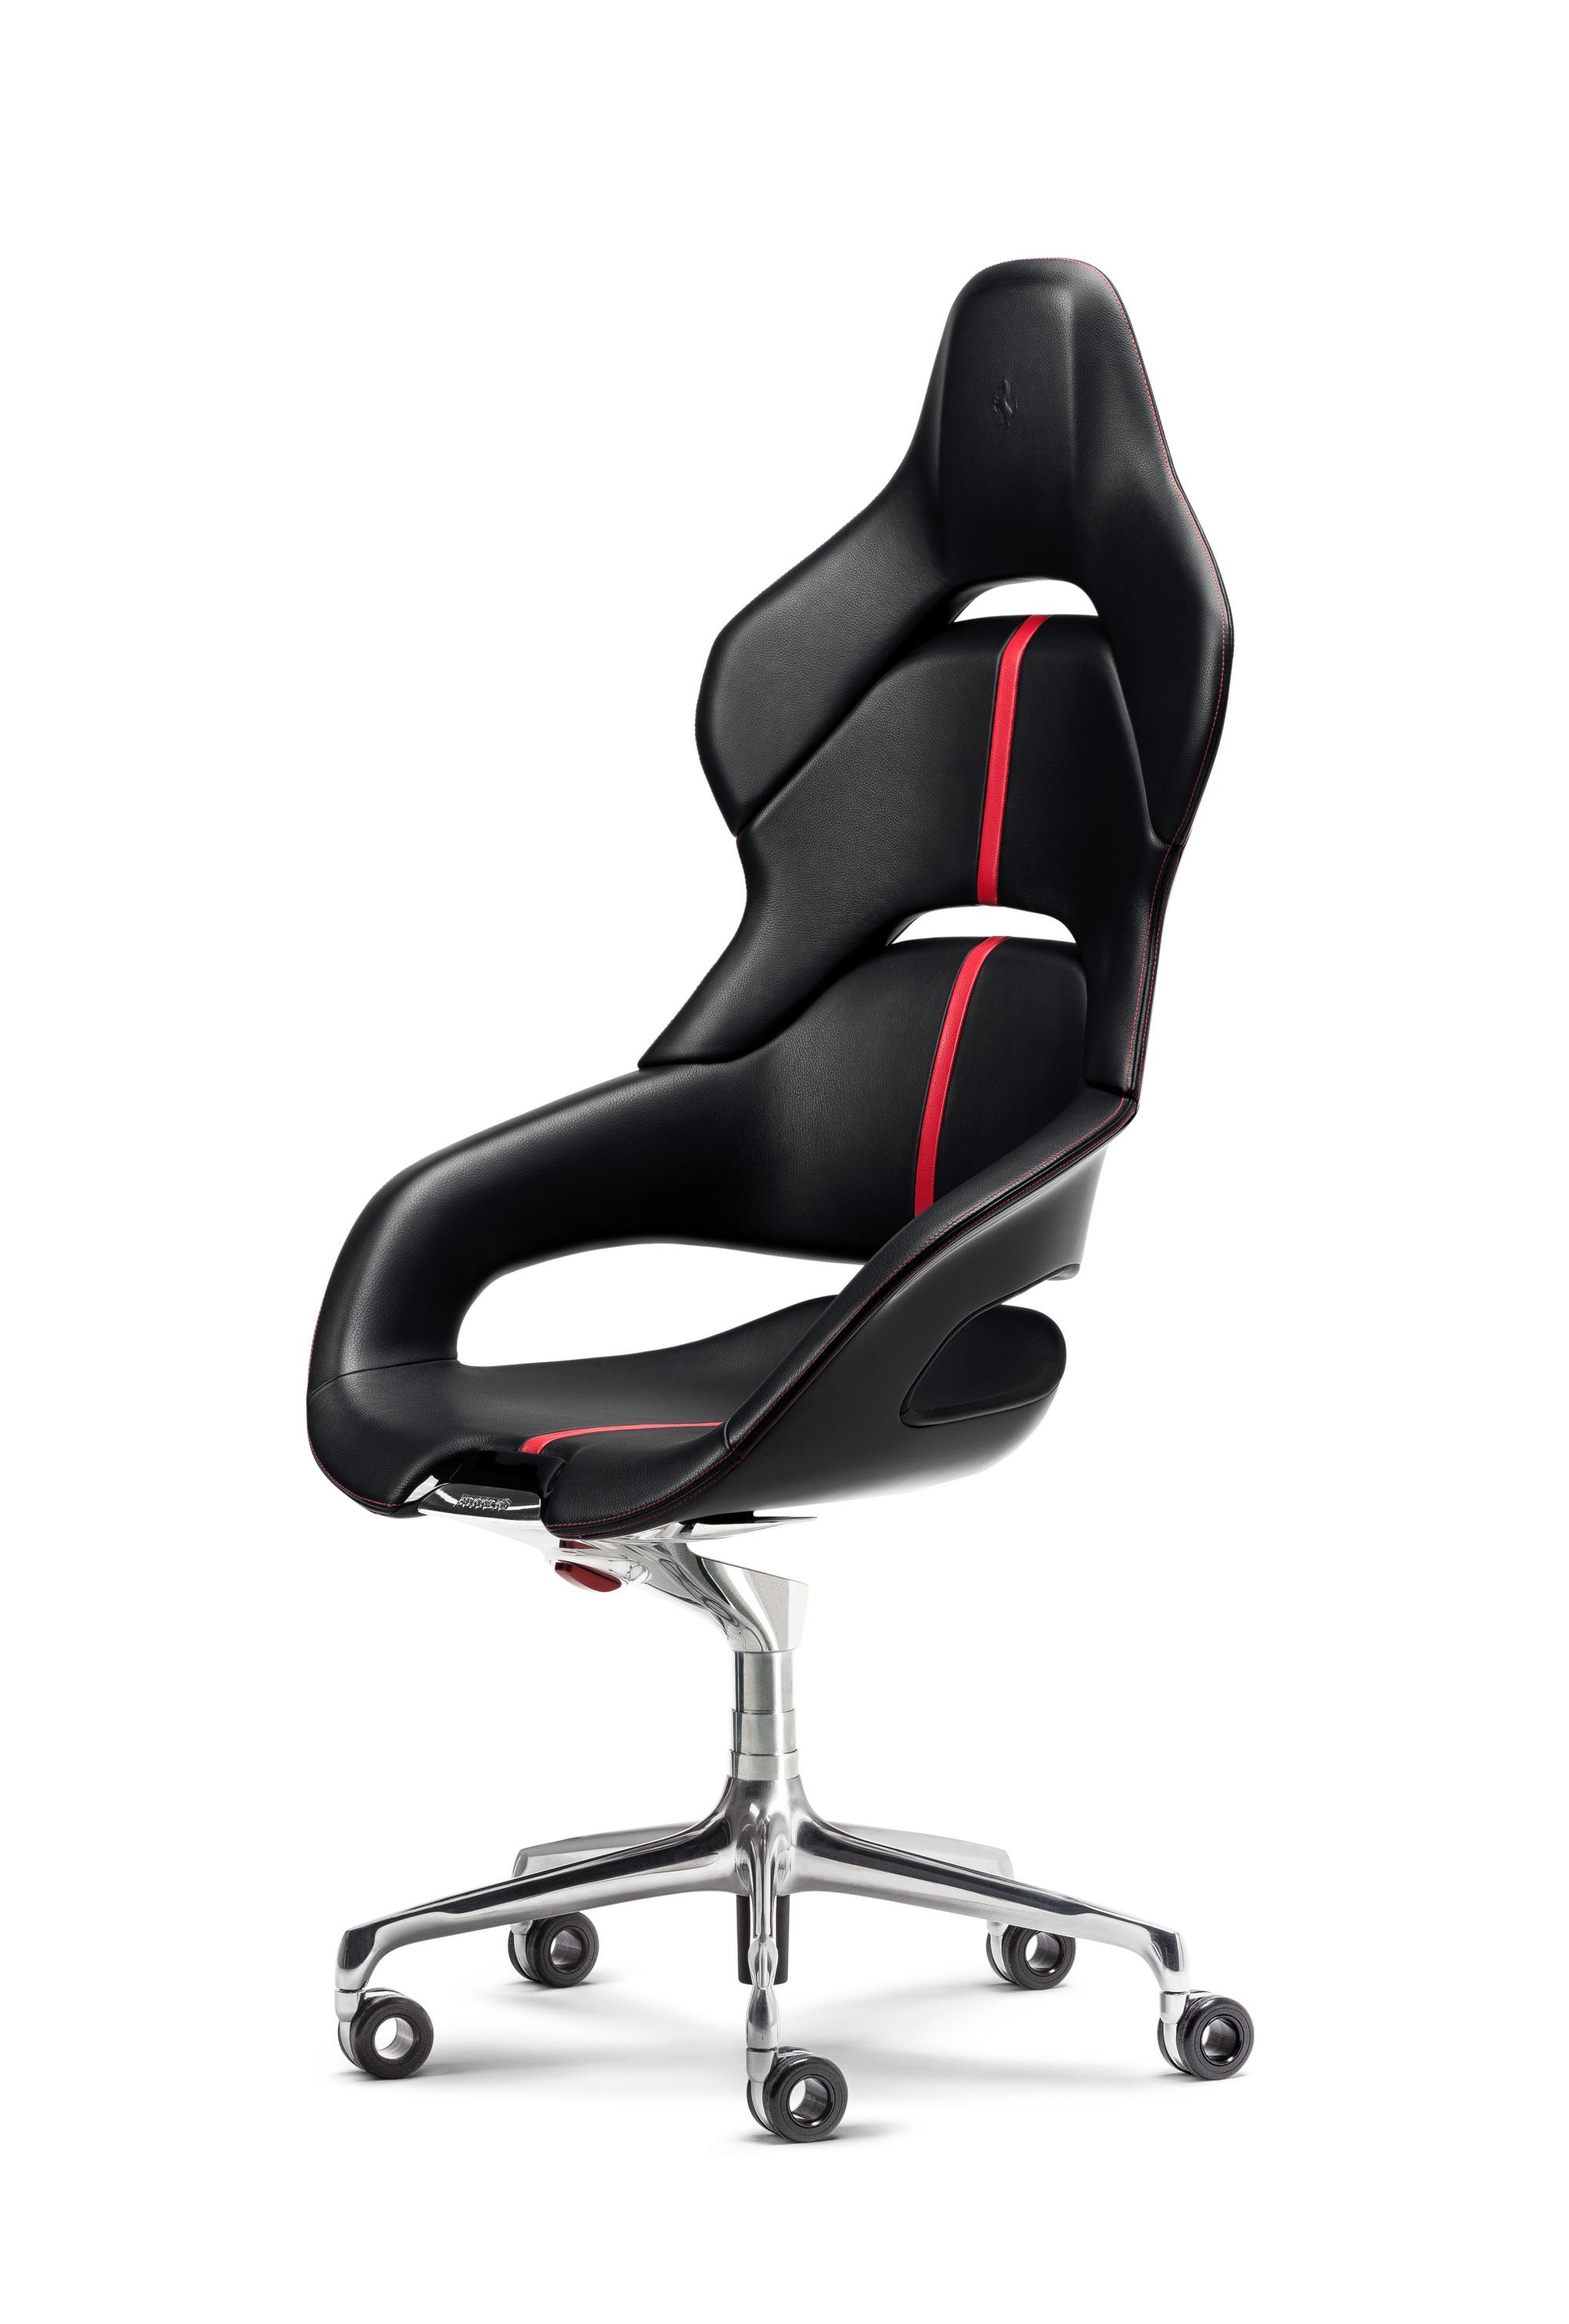 president office chair. President Chair/Cockpit \u2013 SCUDERIA 1. ;  Office Chair